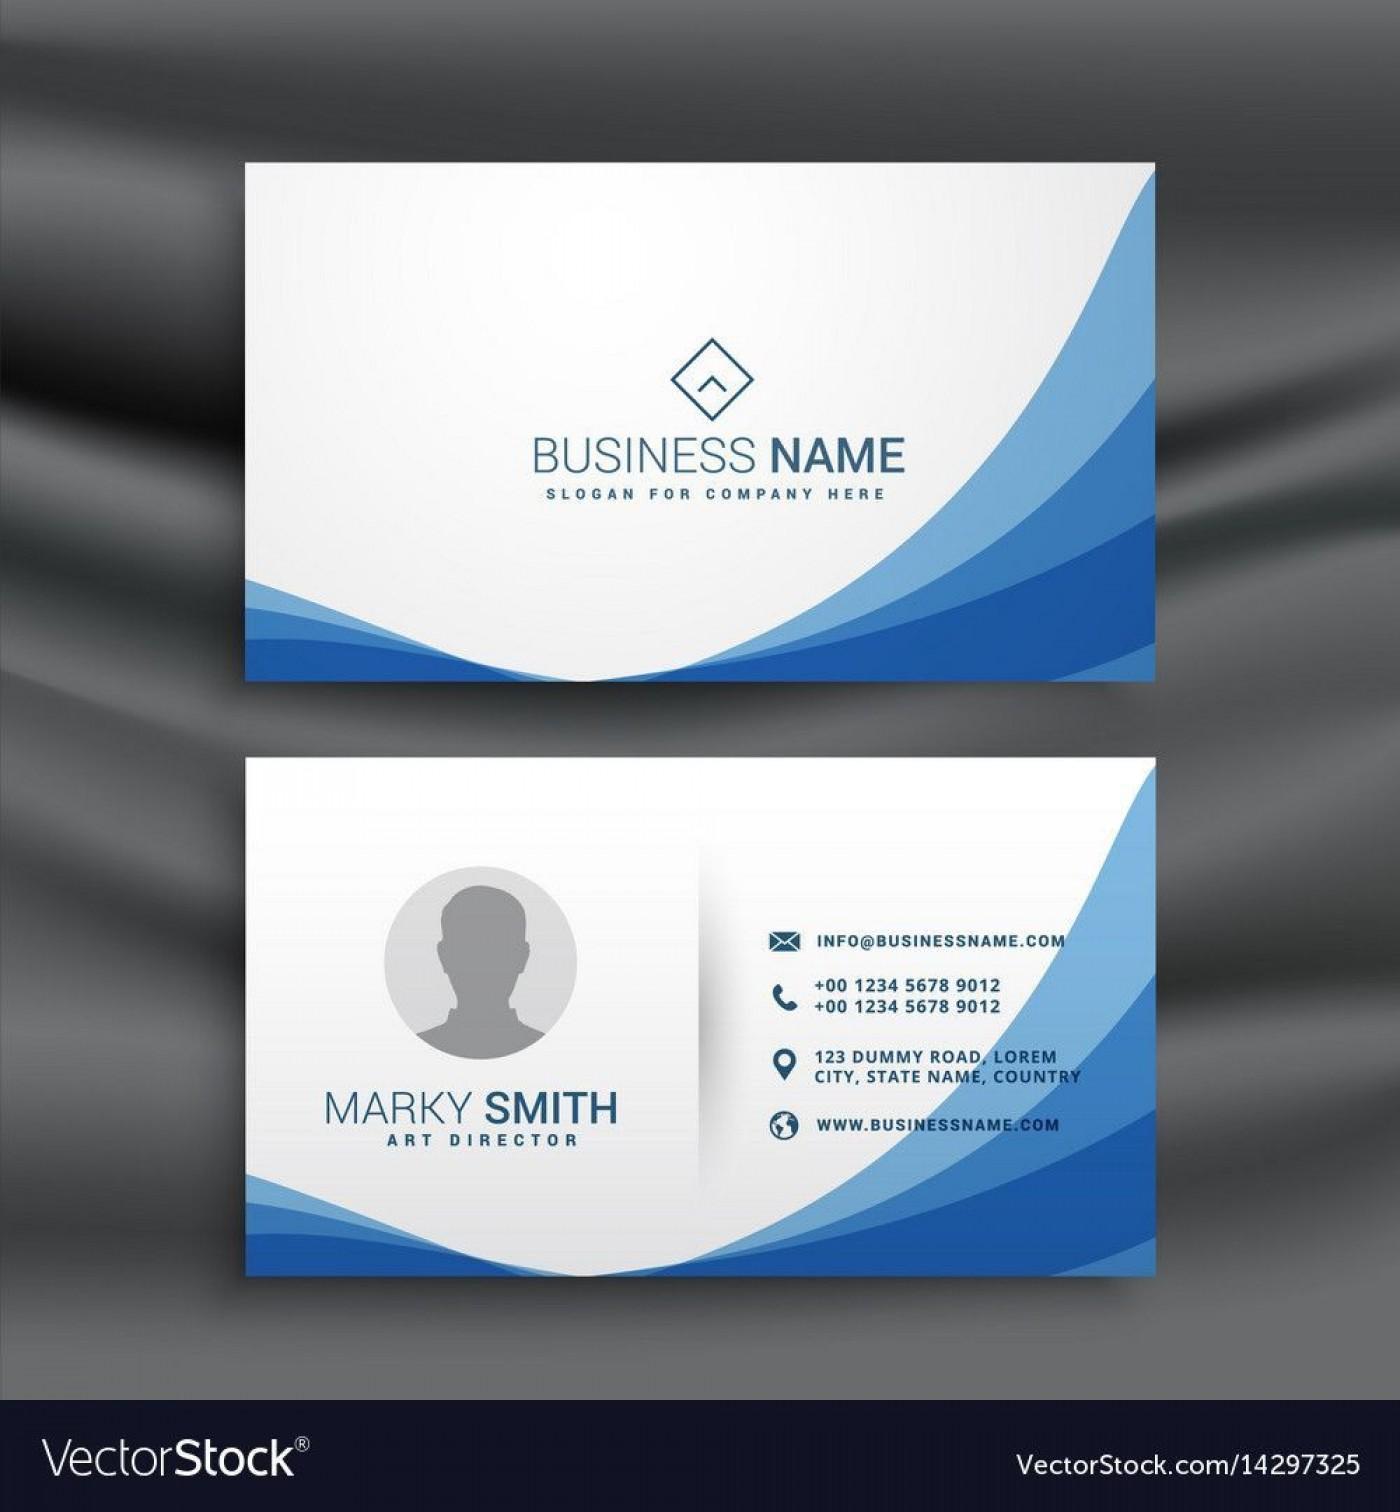 000 Best Simple Visiting Card Design Free Download High Def  Busines Psd File1400